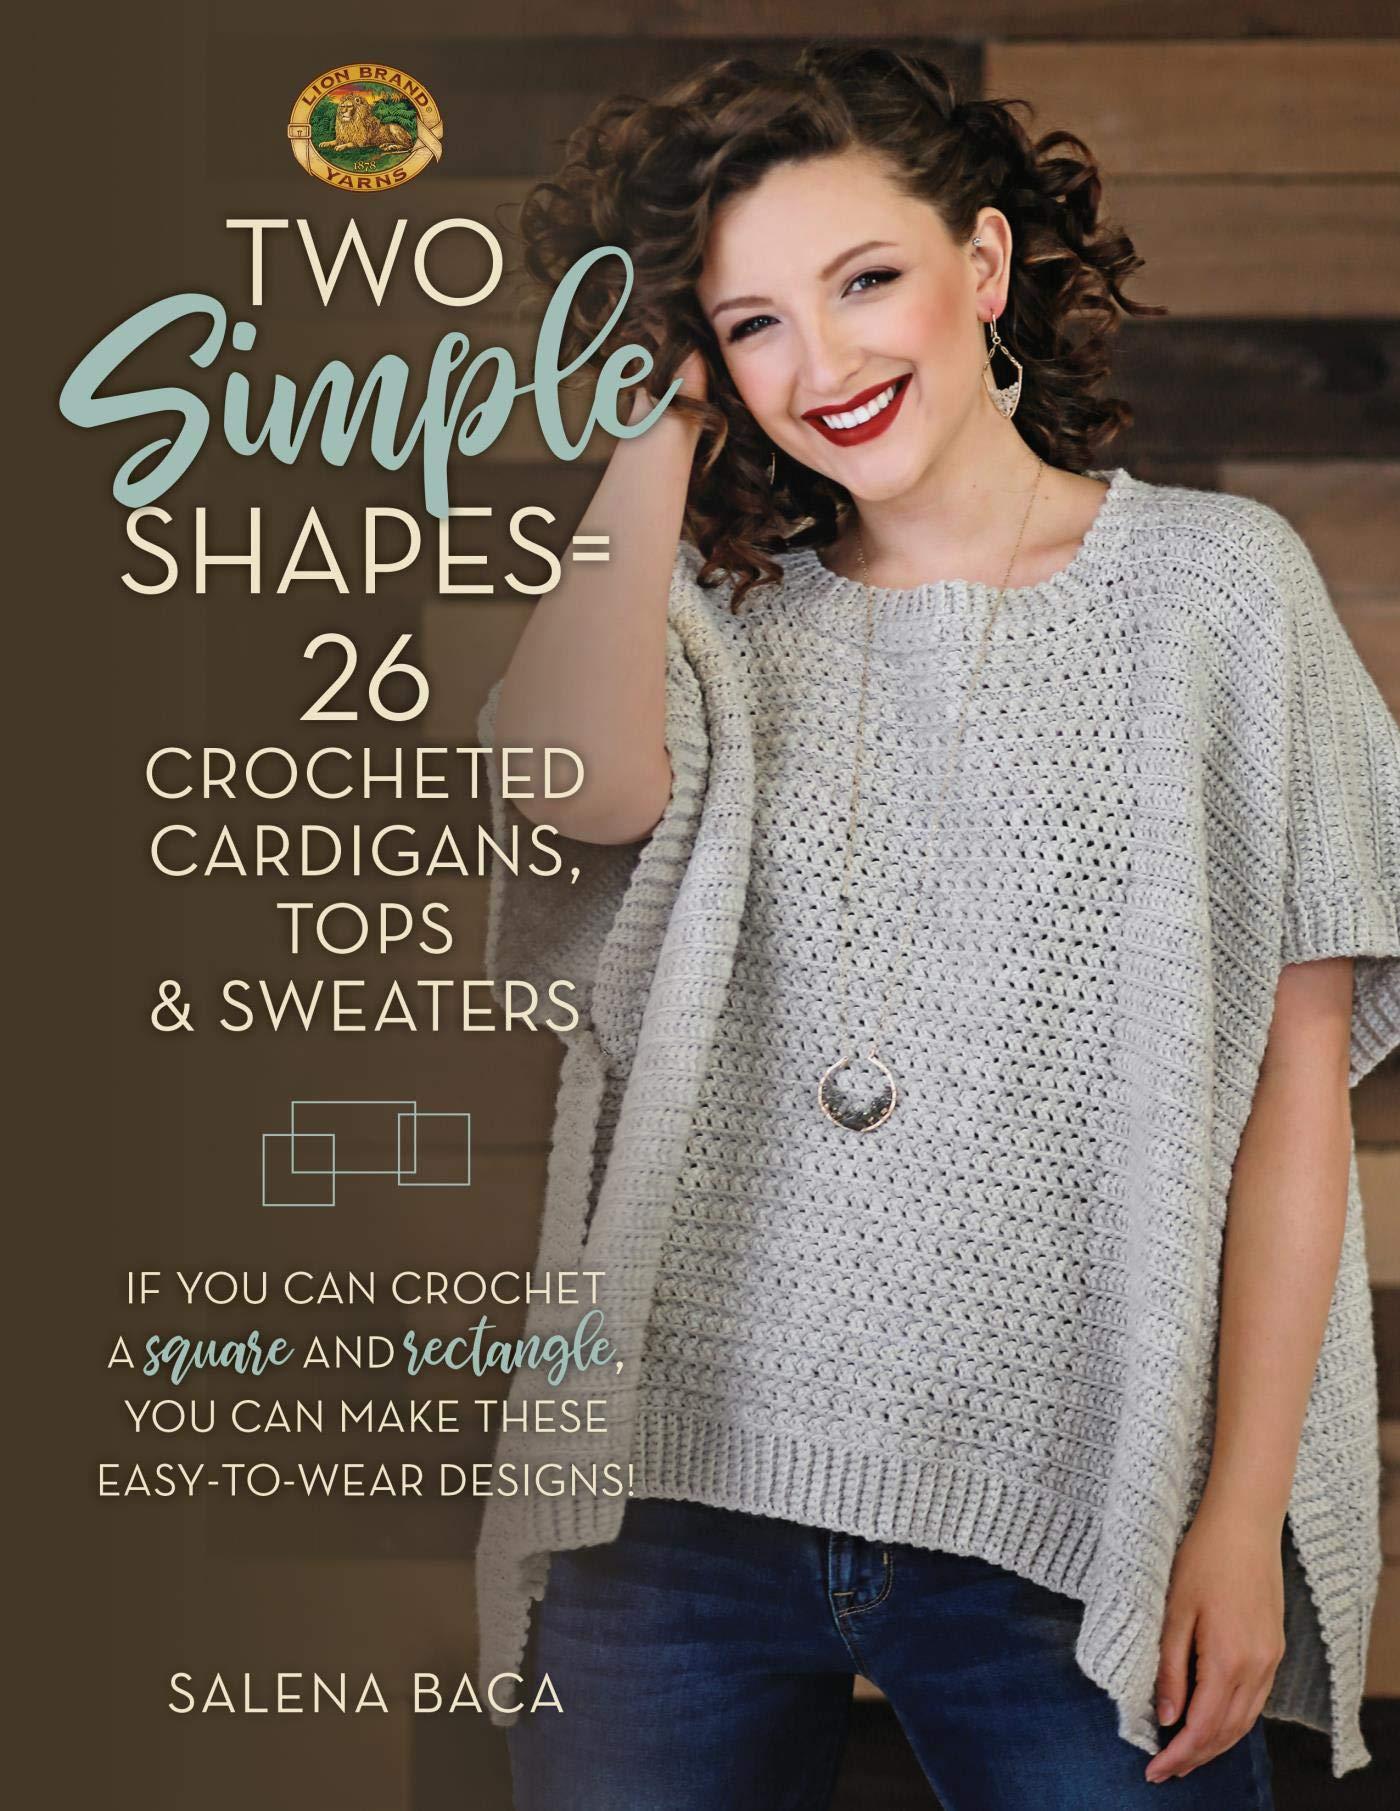 Easy Crochet Shrug Pattern – Crochet and Knitting Patterns